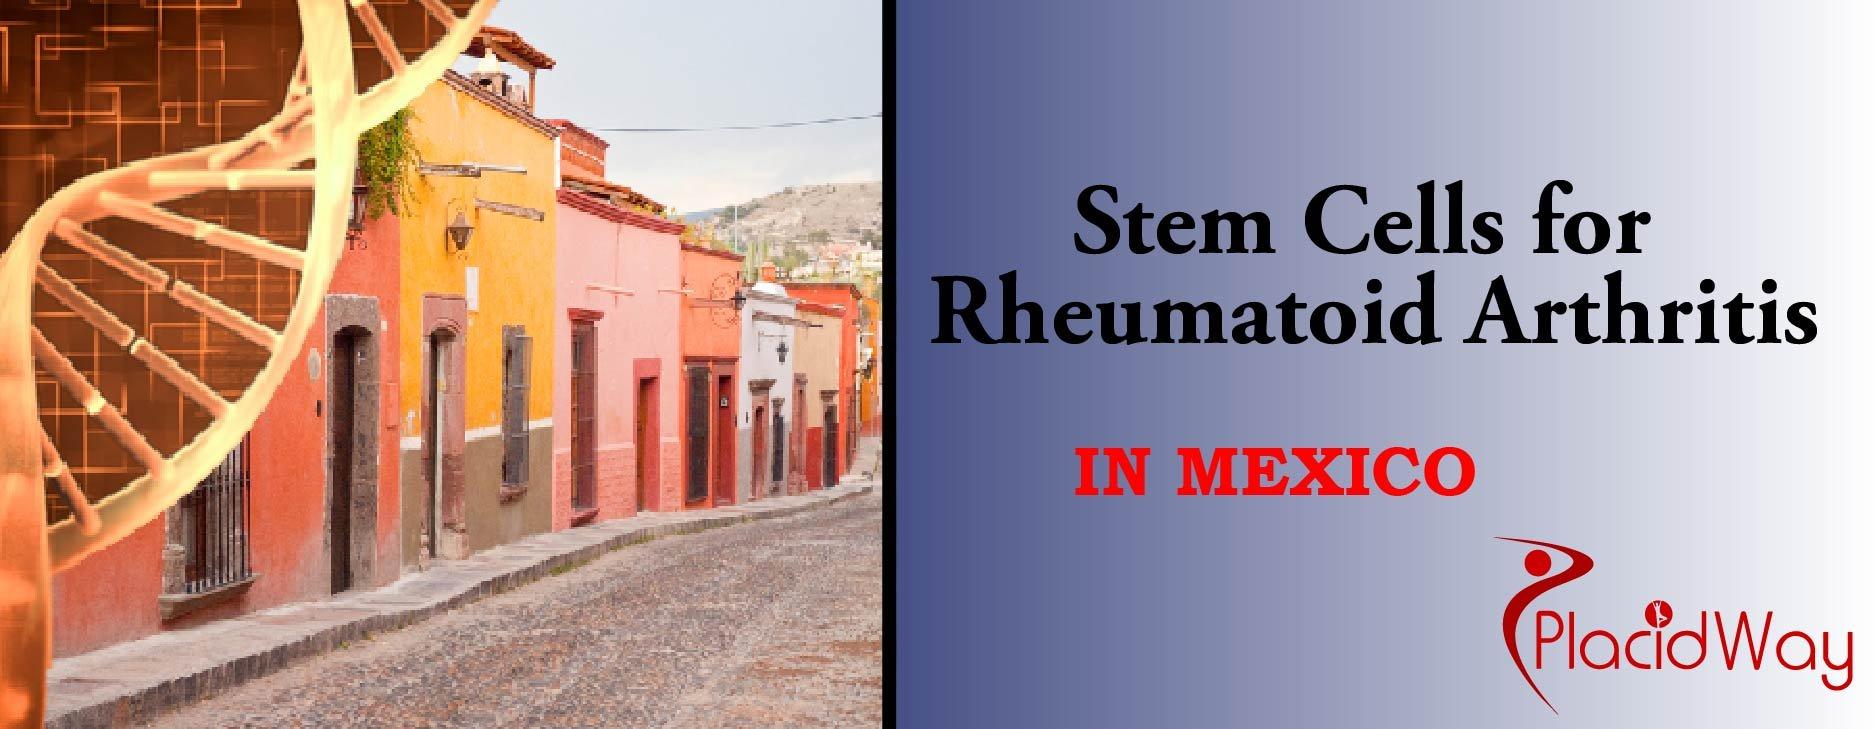 Rheumatoid Arthritis Stem Cell Treatments, Stem Cell Rhematoid Arthritis Surgery